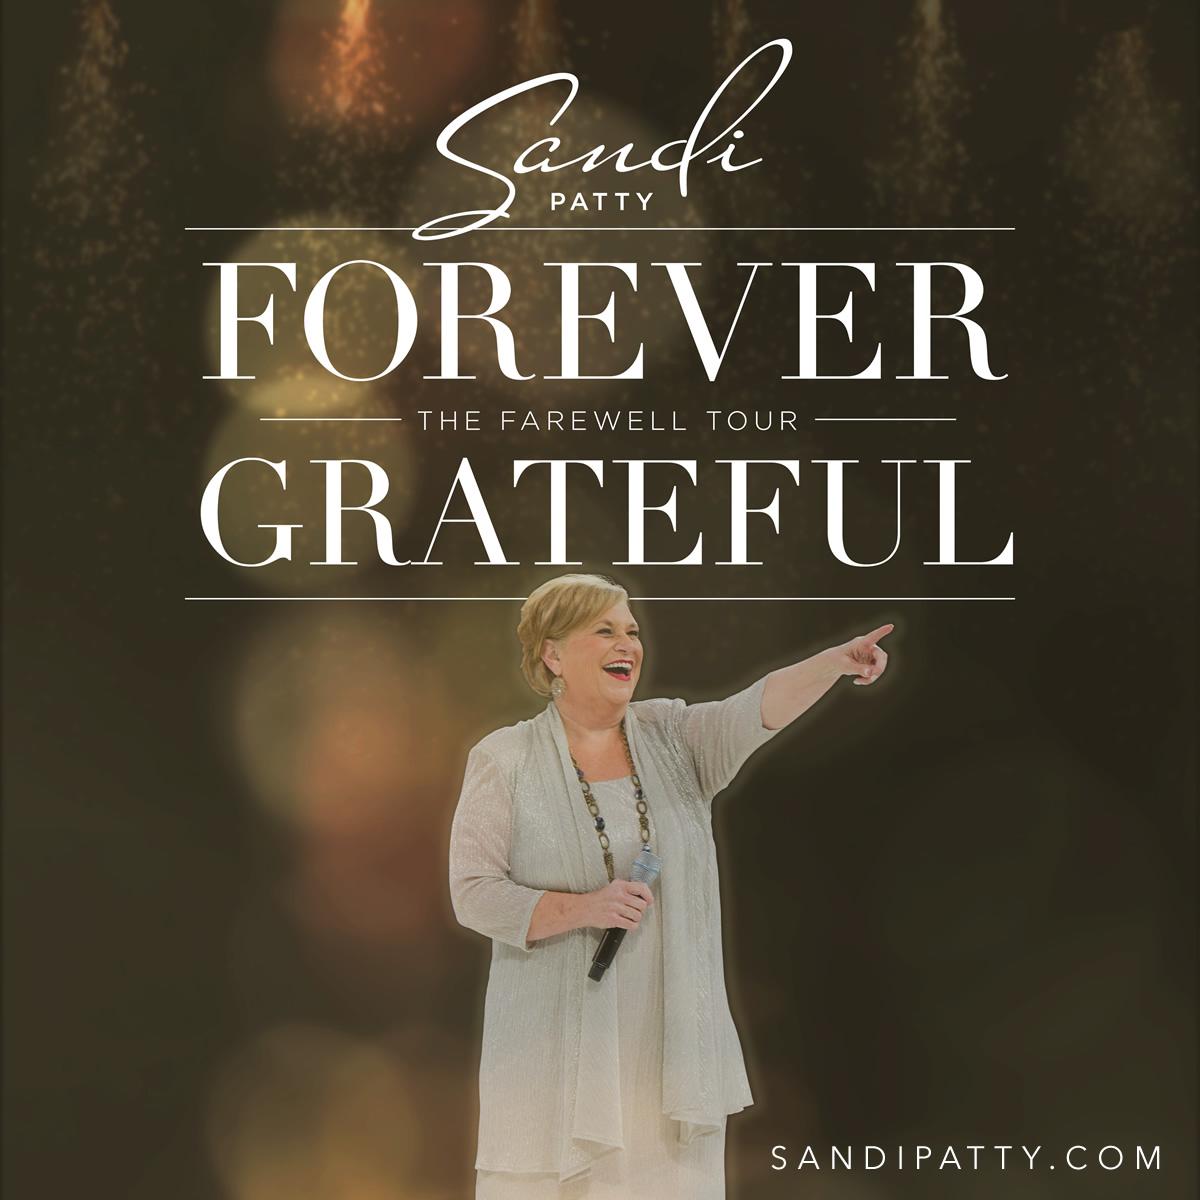 Sandi pattys first husband - An Open Letter To Sandi Patty Www Herviewfromhome Com